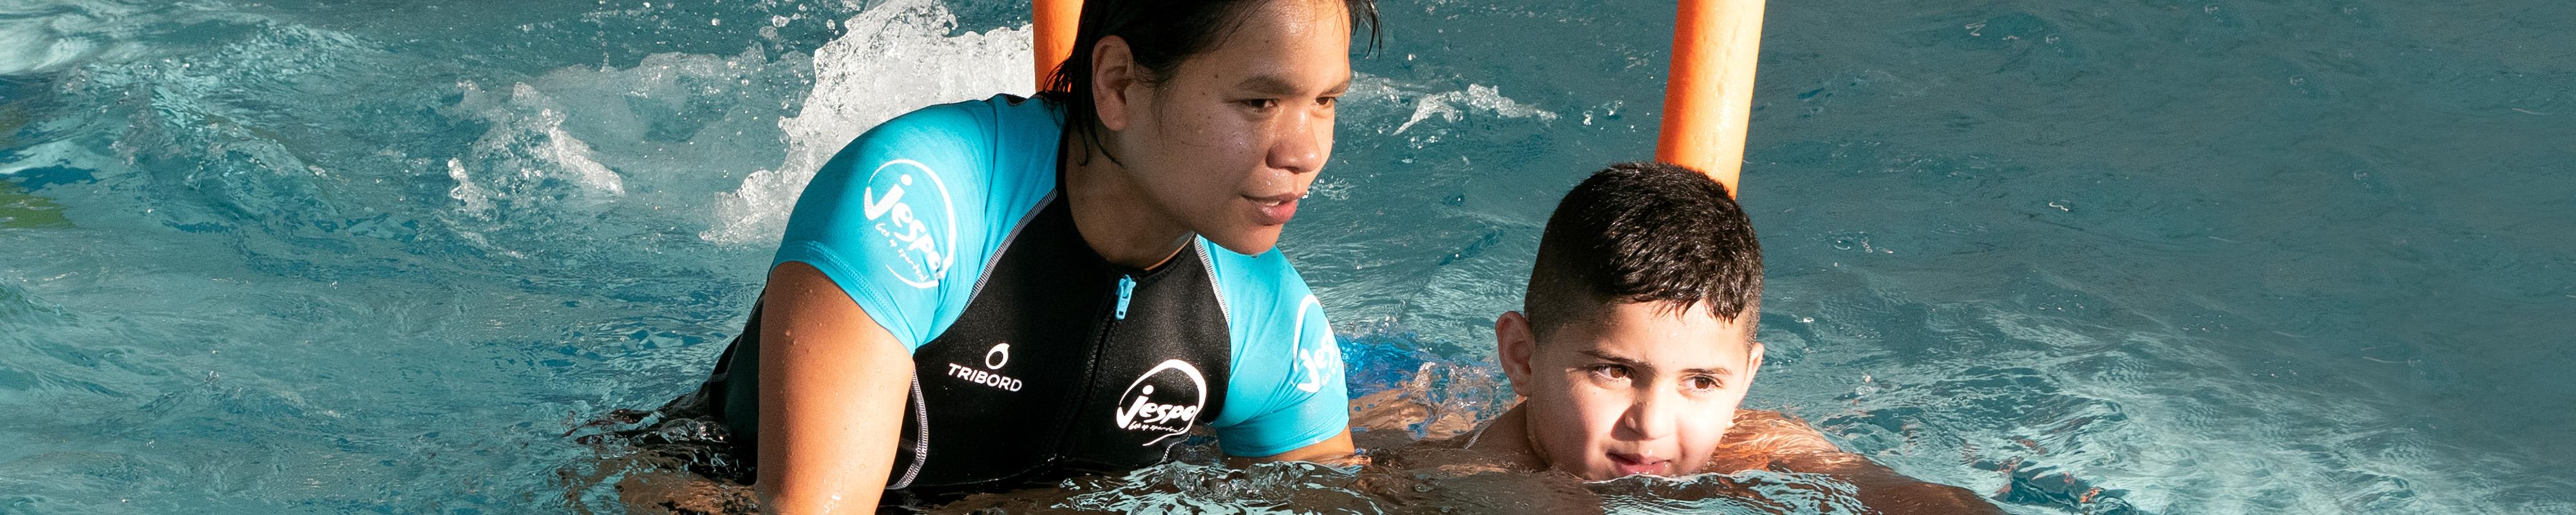 4000×800 – Vrijwilliger zwemmen